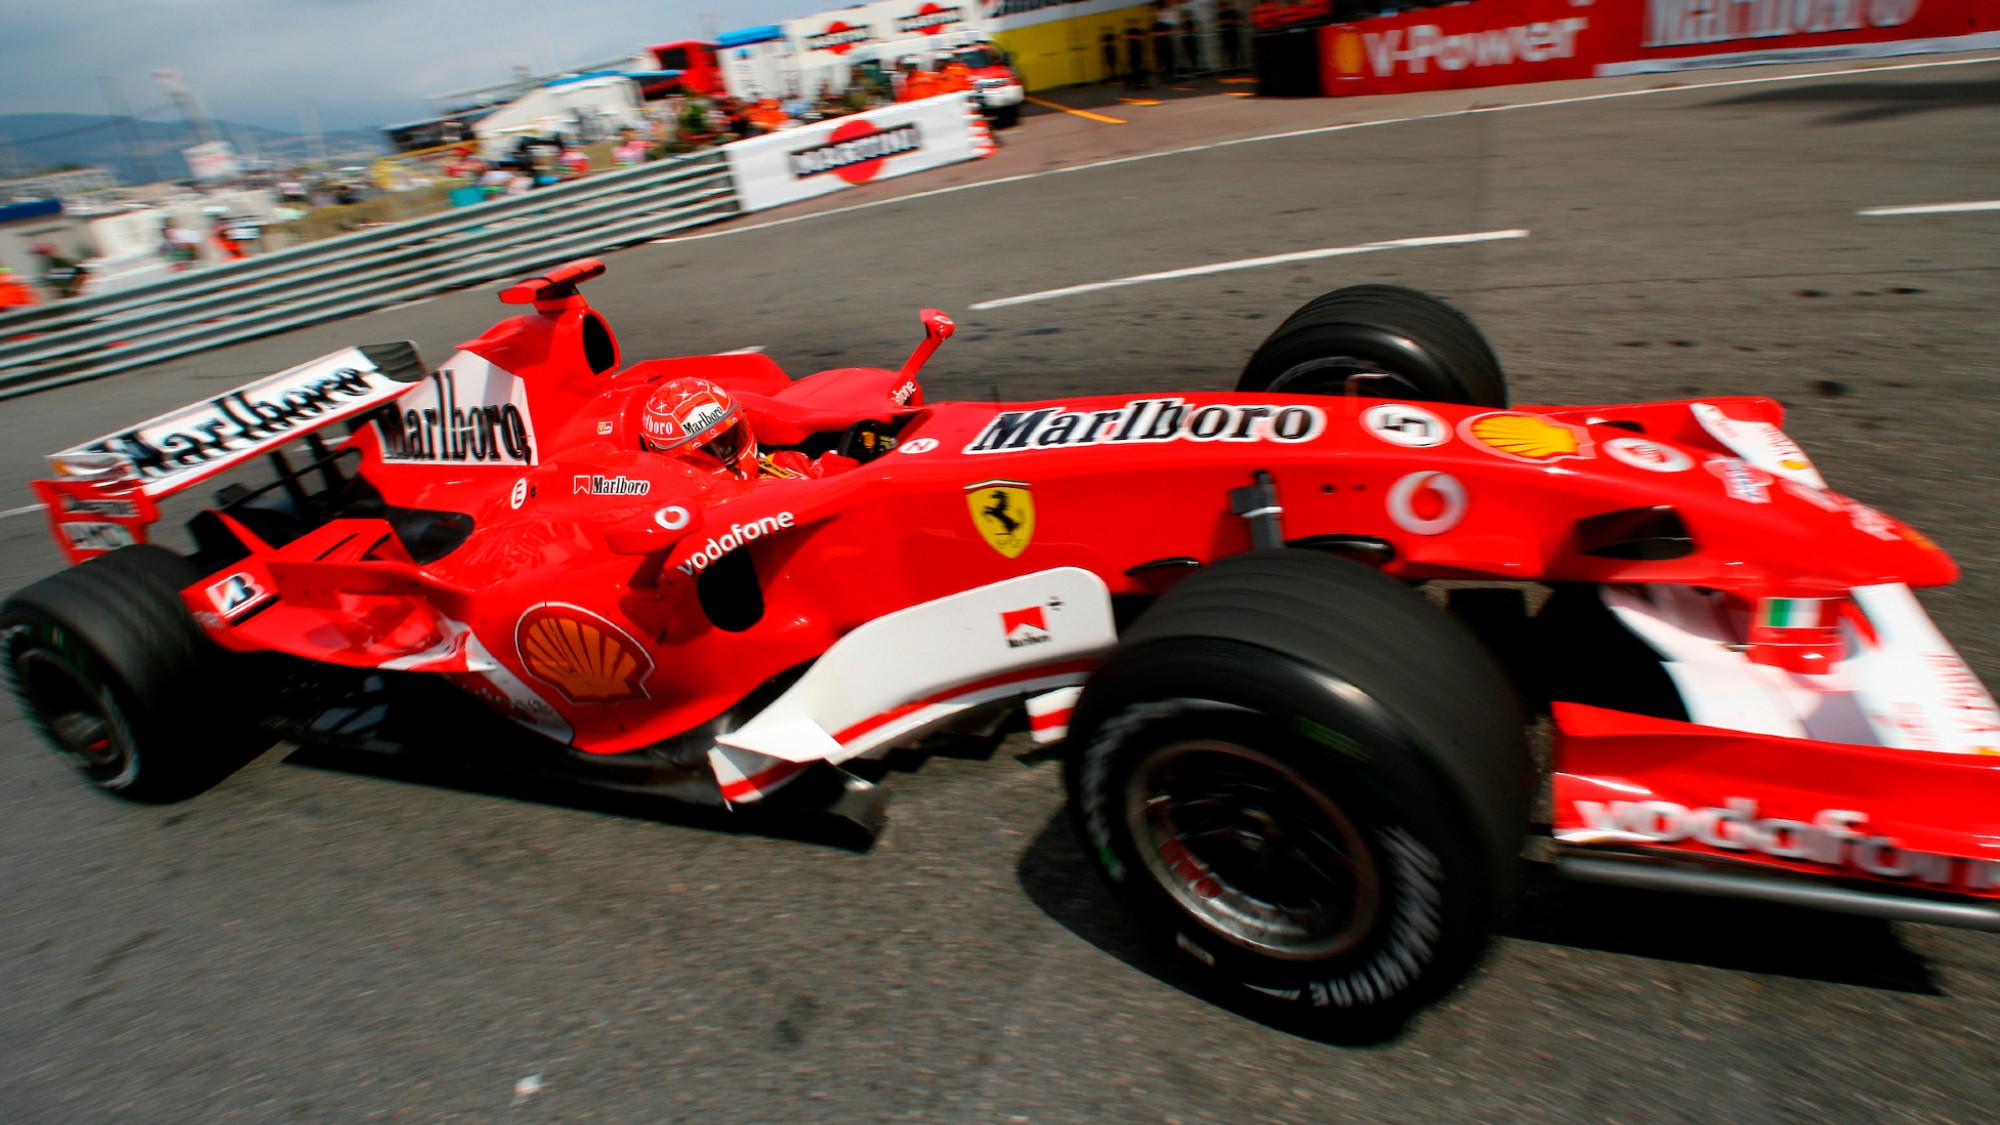 Michael Schumacher, 2006 Monaco GP